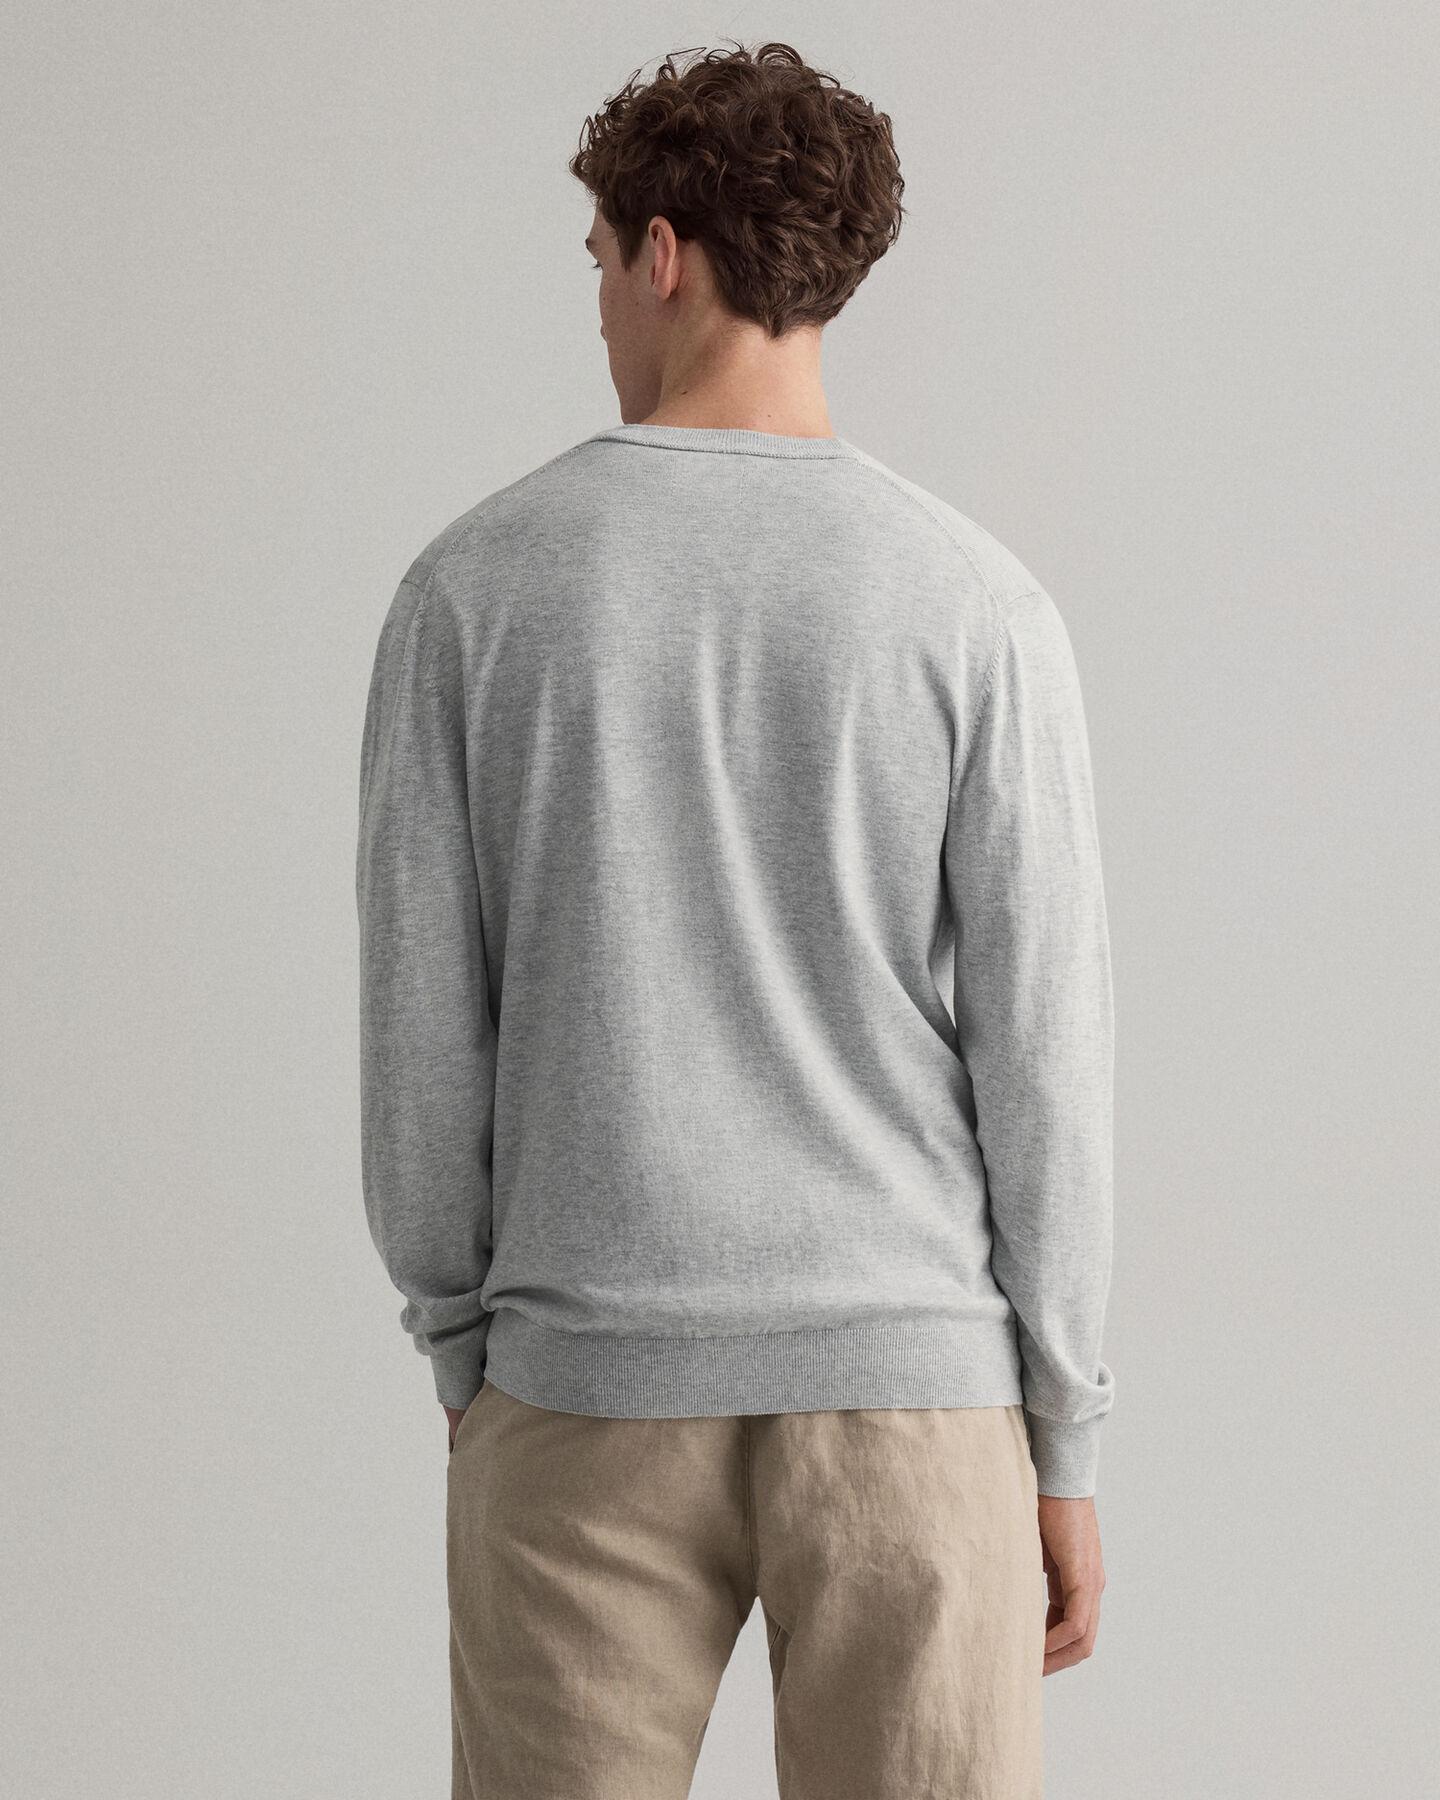 Baumwoll Seiden V-Neck Strickjacke